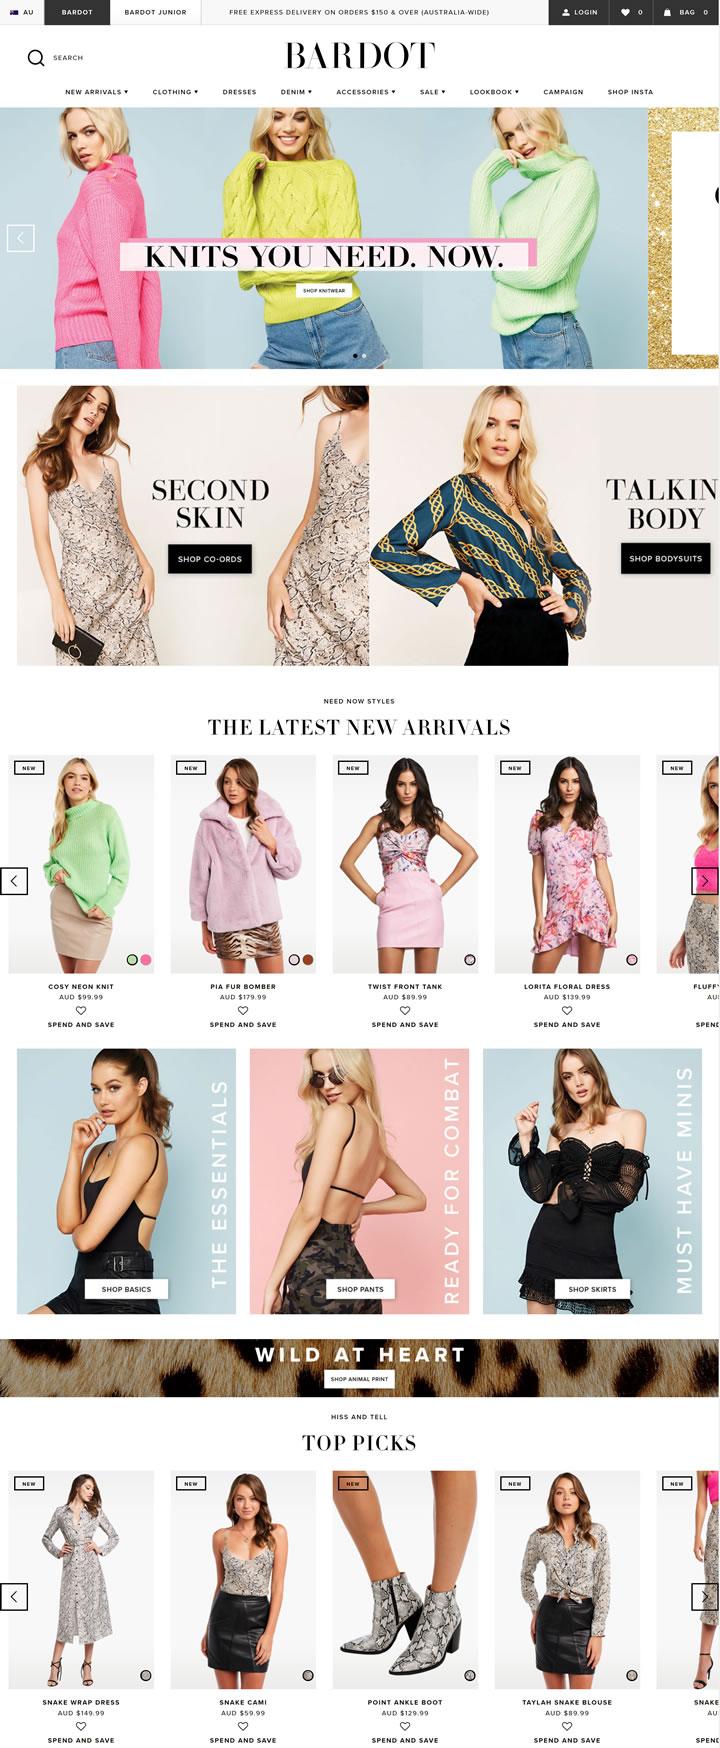 Bardot官网:澳大利亚时装品牌